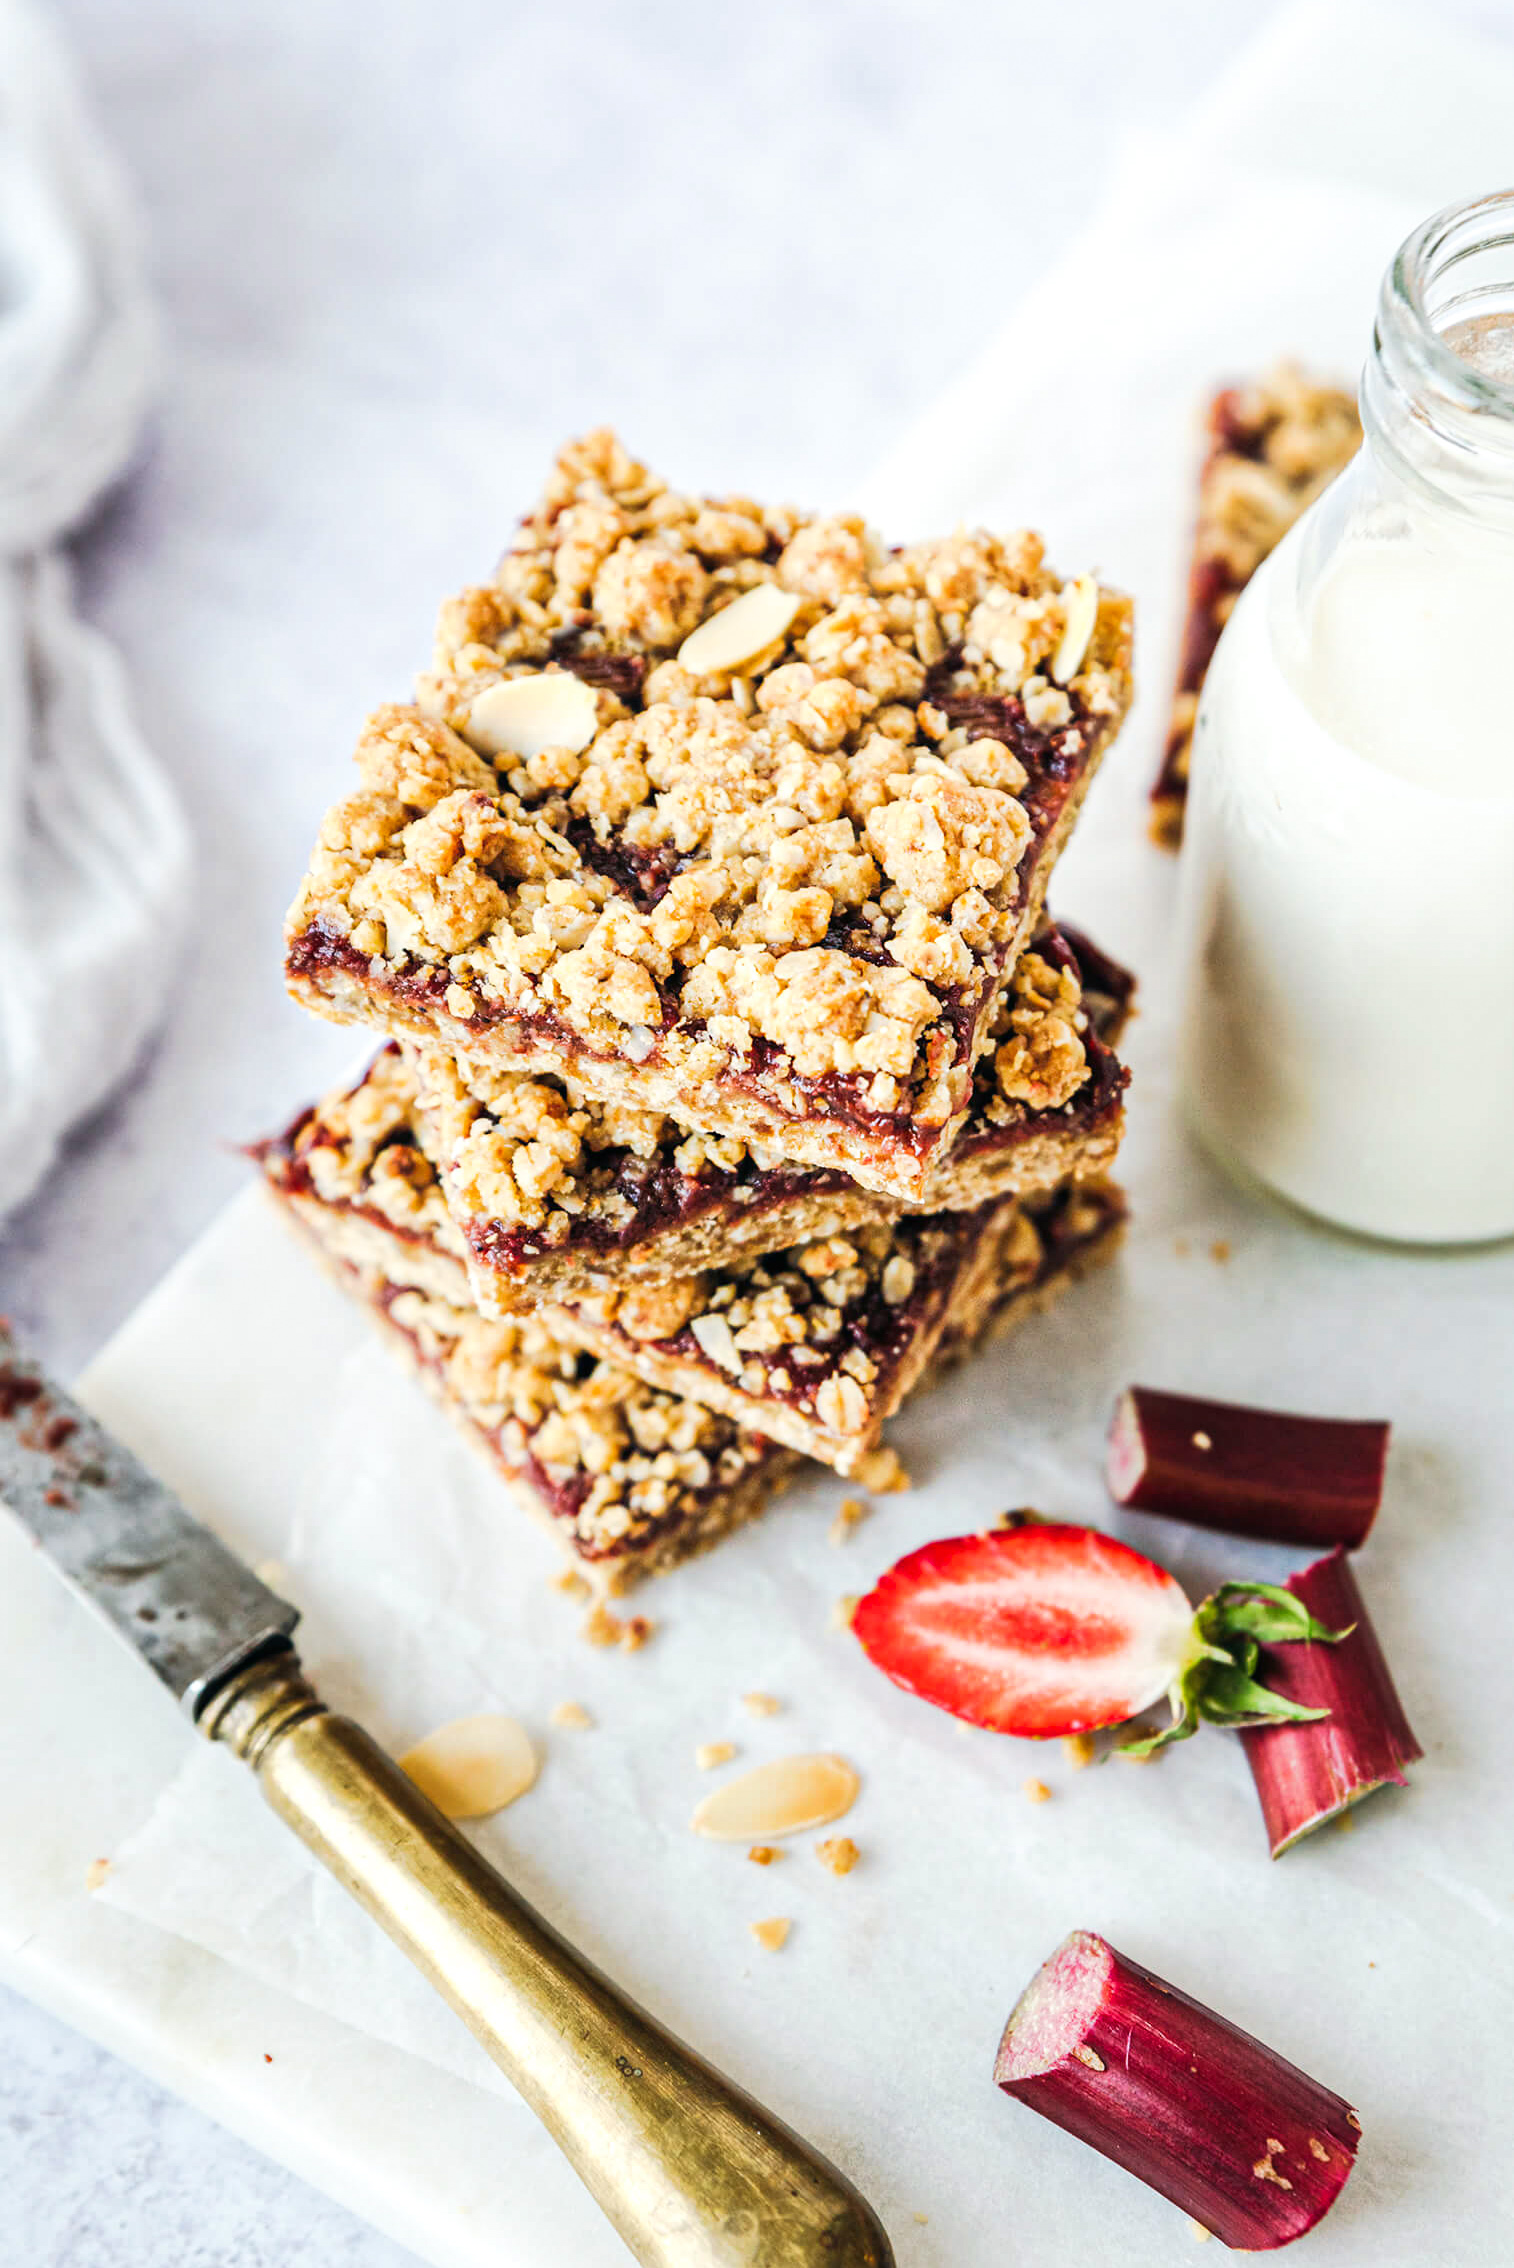 Tarte rhubarbe fraise crumble - Lilie Bakery